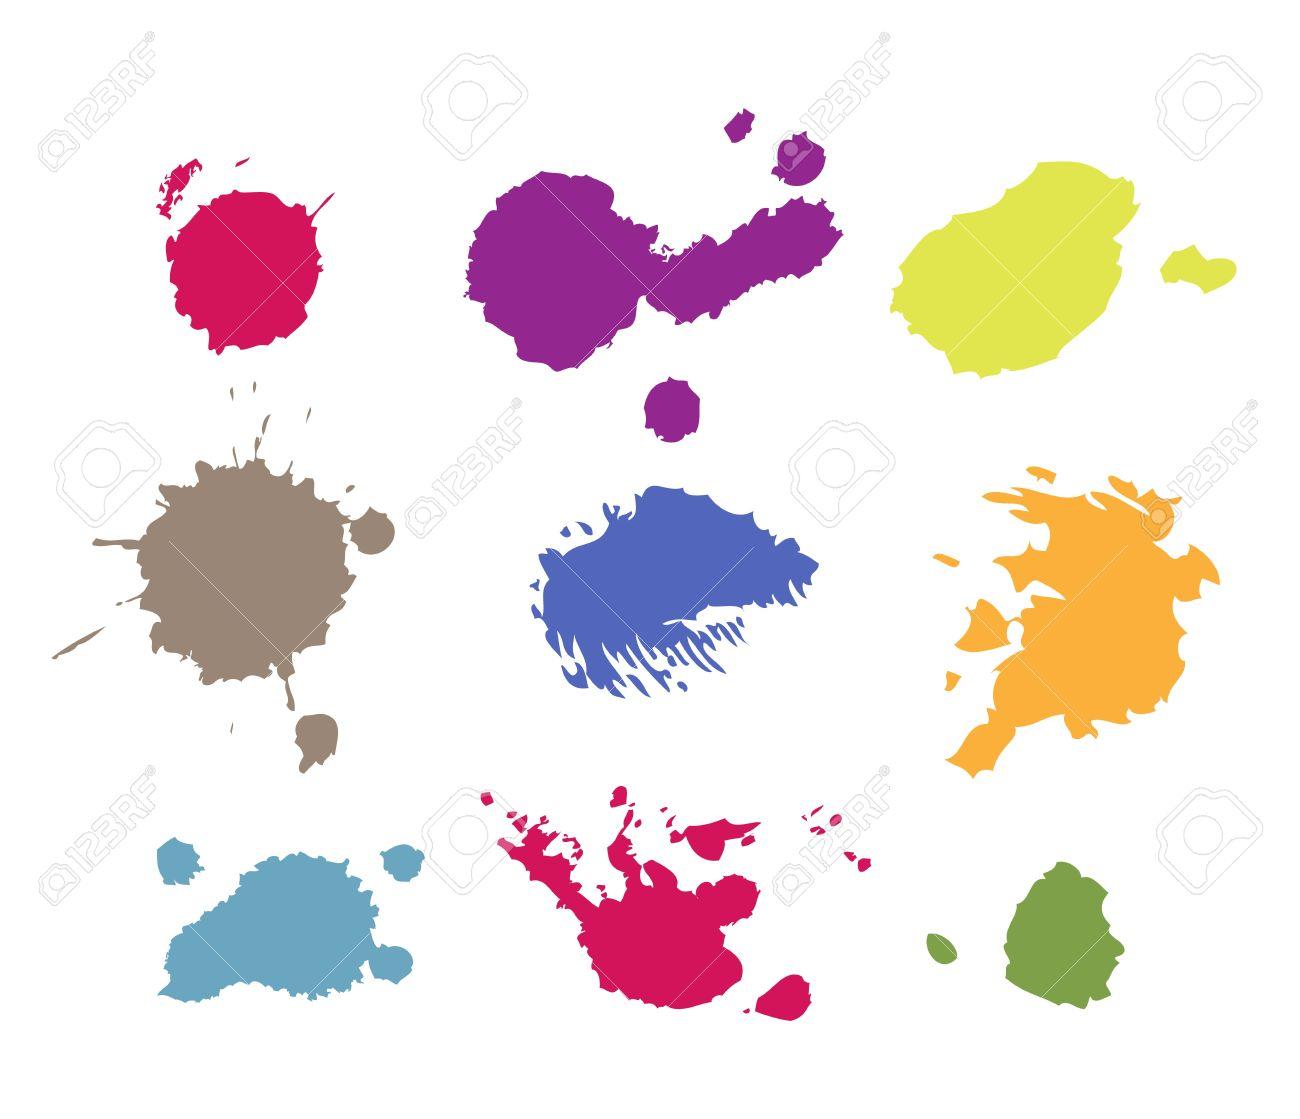 grunge paint splashes drips and splatter royalty free cliparts rh 123rf com paint splatter vector free paint splatter vector brushes illustrator